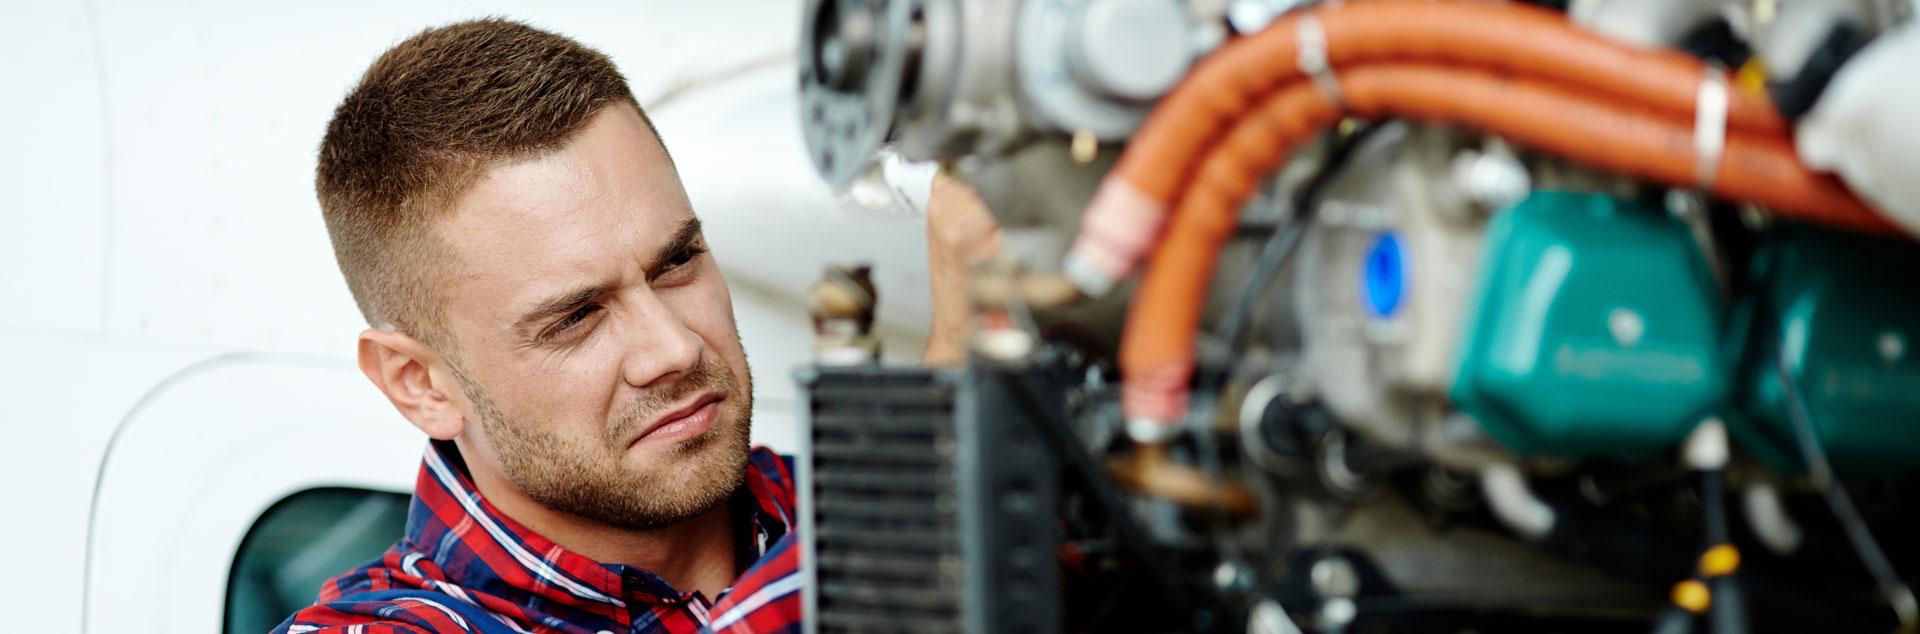 MRO: Mechanic works on aircraft engine.